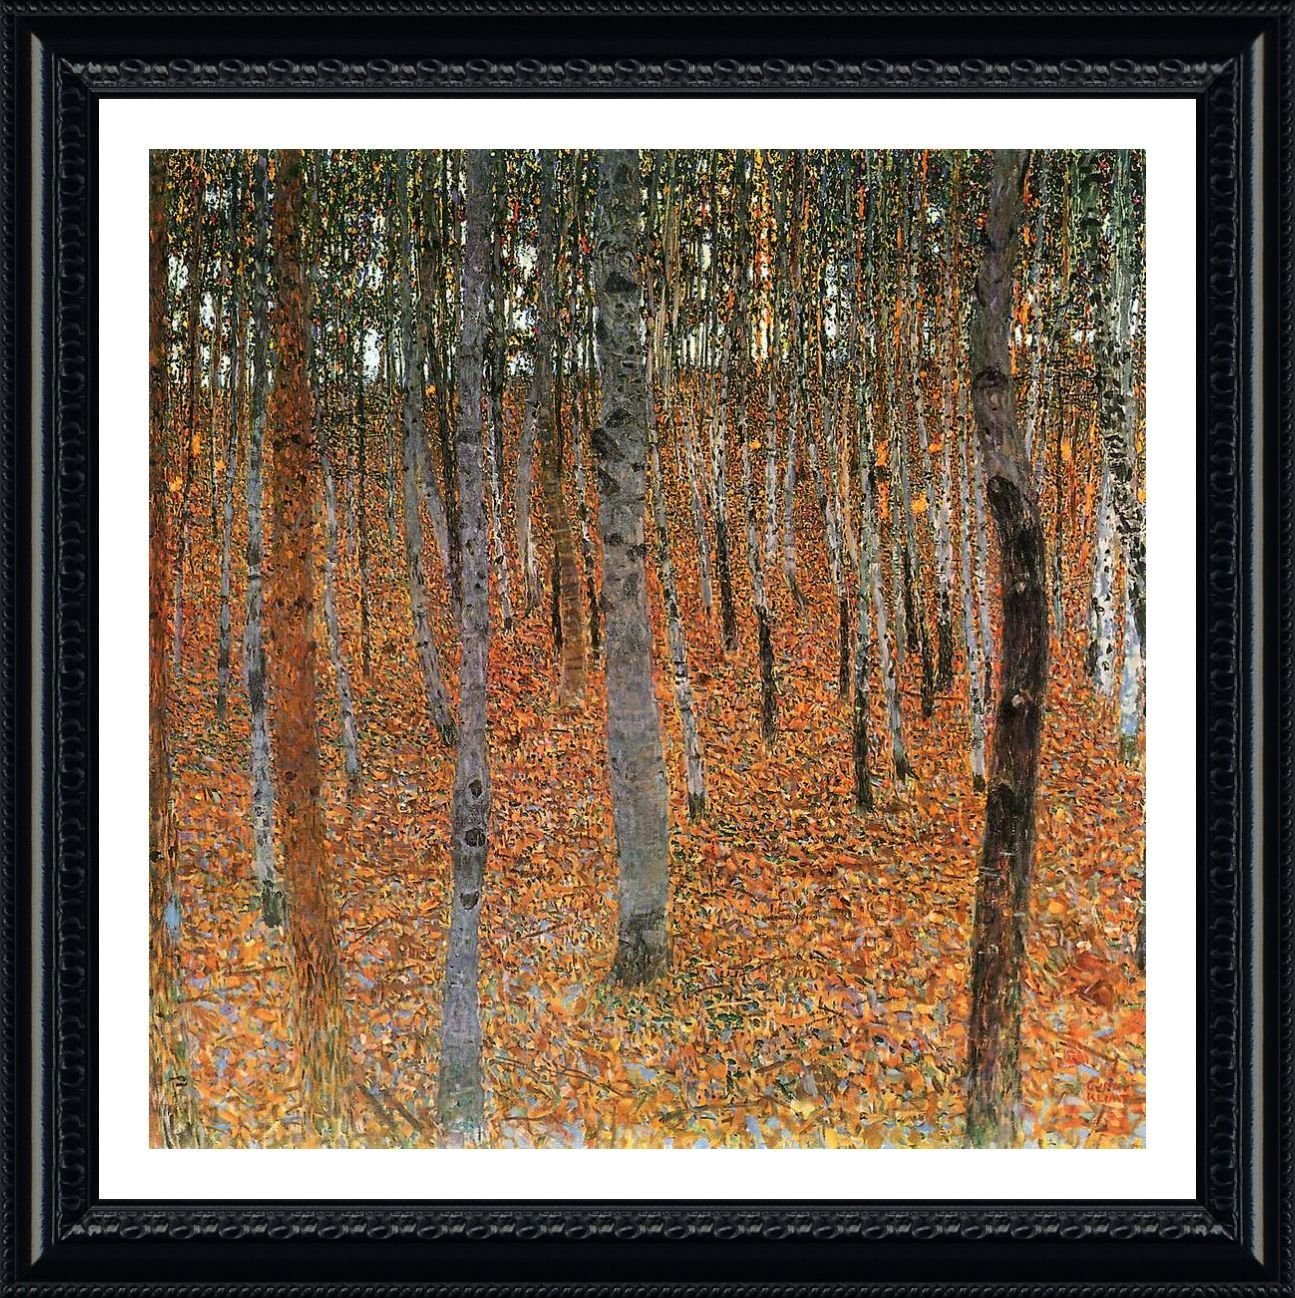 b778965c926 Alonline Art - Forest Gustav Klimt Black FRAMED POSTER (Print on 100%  Cotton CANVAS on foam board) - READY TO HANG